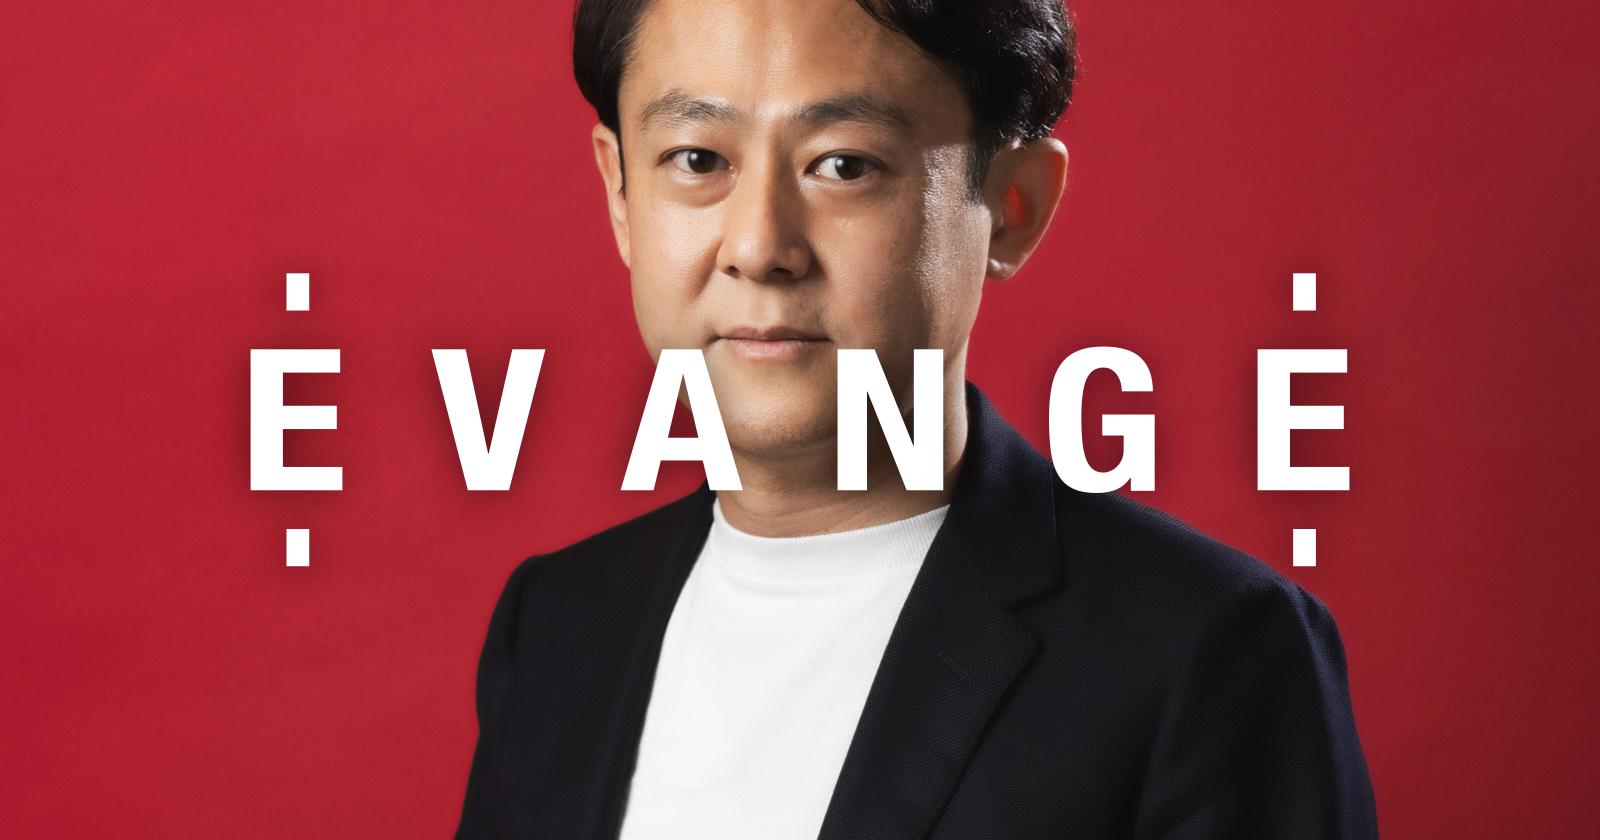 「EVANGE」記事公開 – 渡邉 雄介 氏(Zeals コーポレートストラテジー)